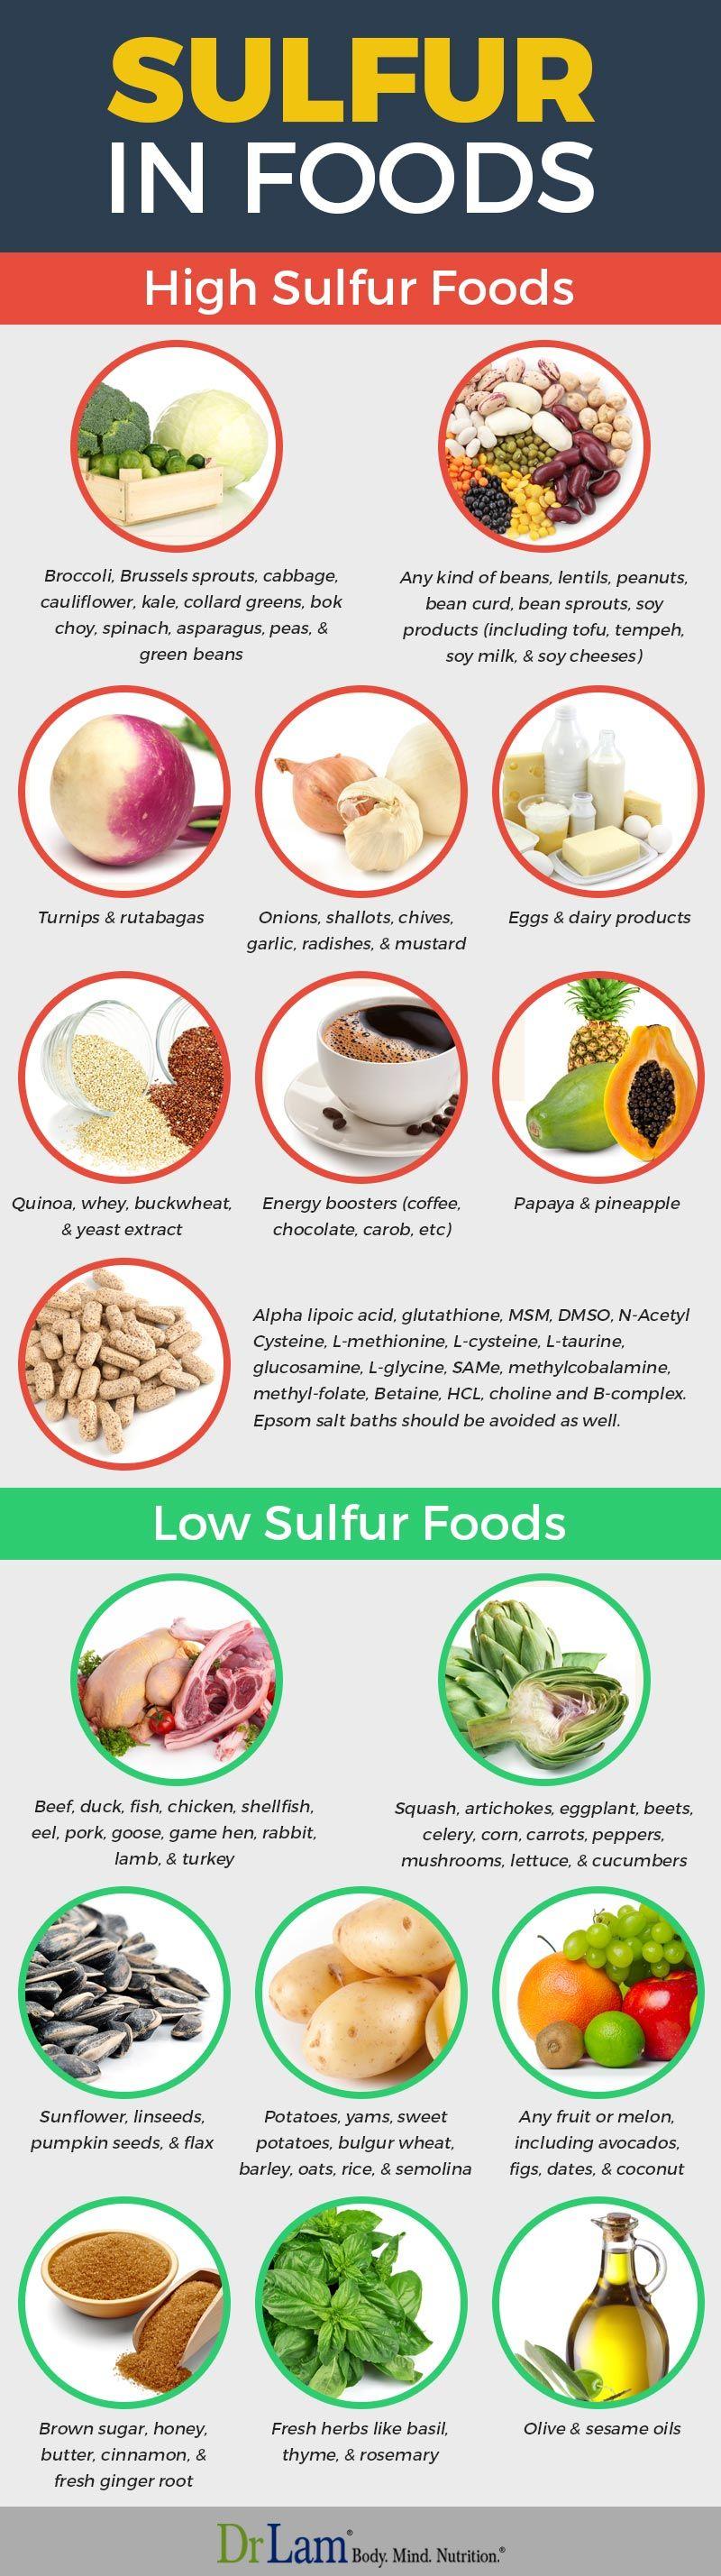 Making sense of the surprising health hazards of foods high in making sense of the surprising health hazards of foods high in sulfur forumfinder Images